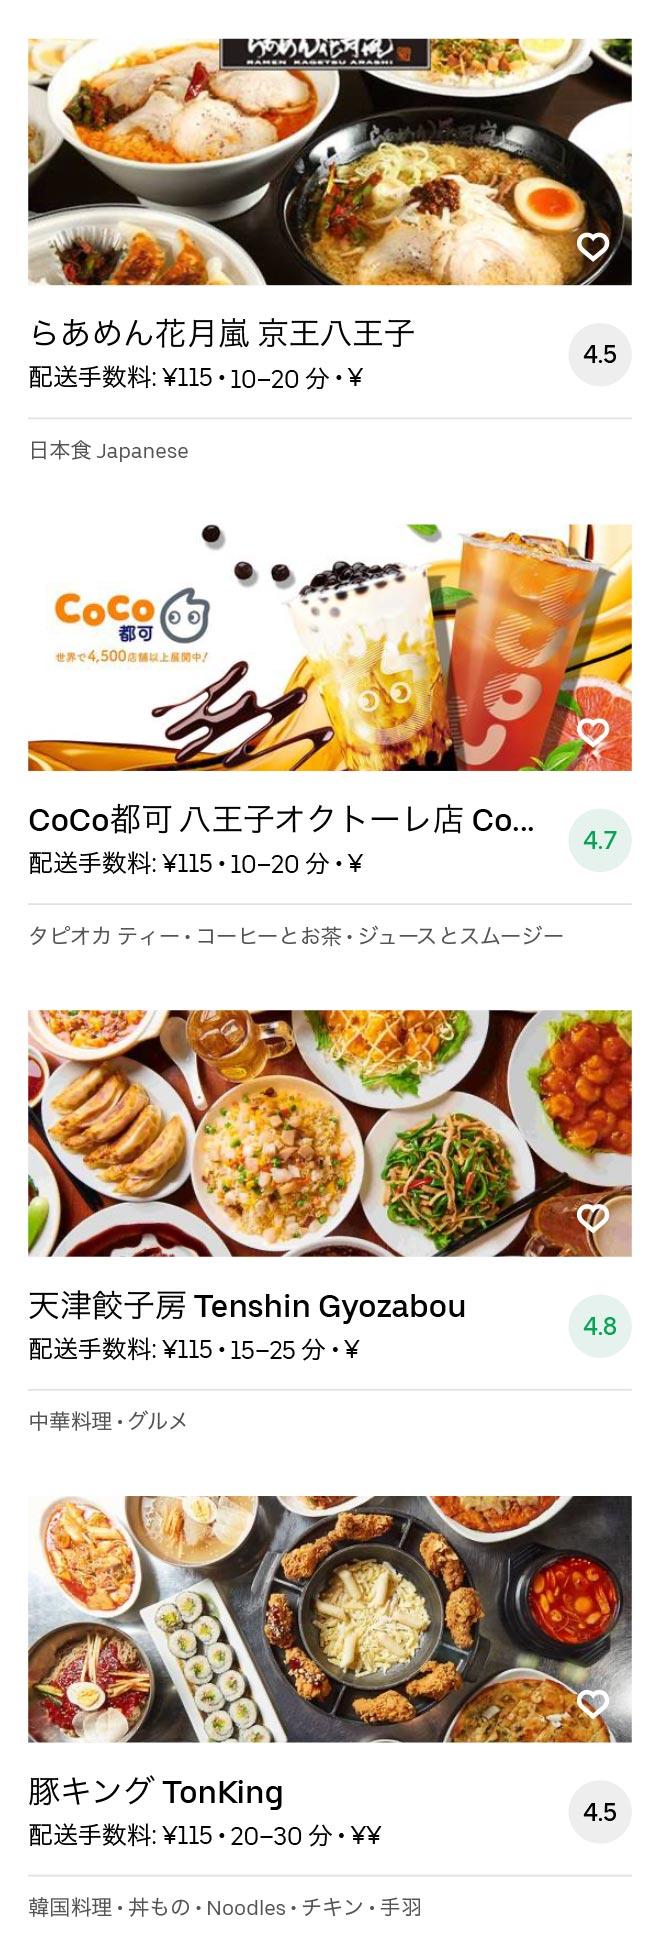 Hatioji menu 2010 03